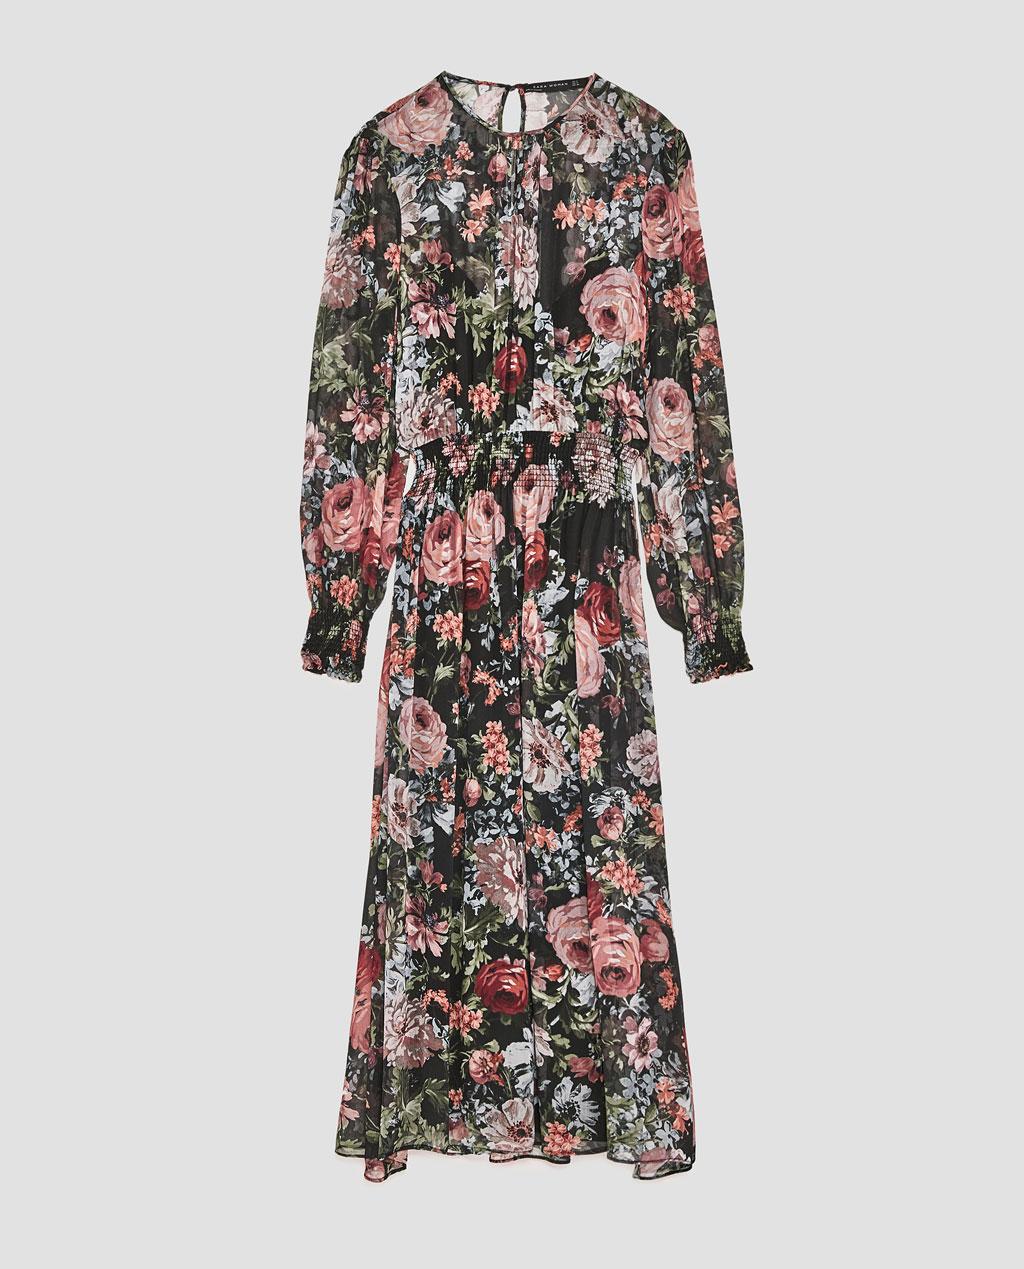 Printed Midi Dress, Zara